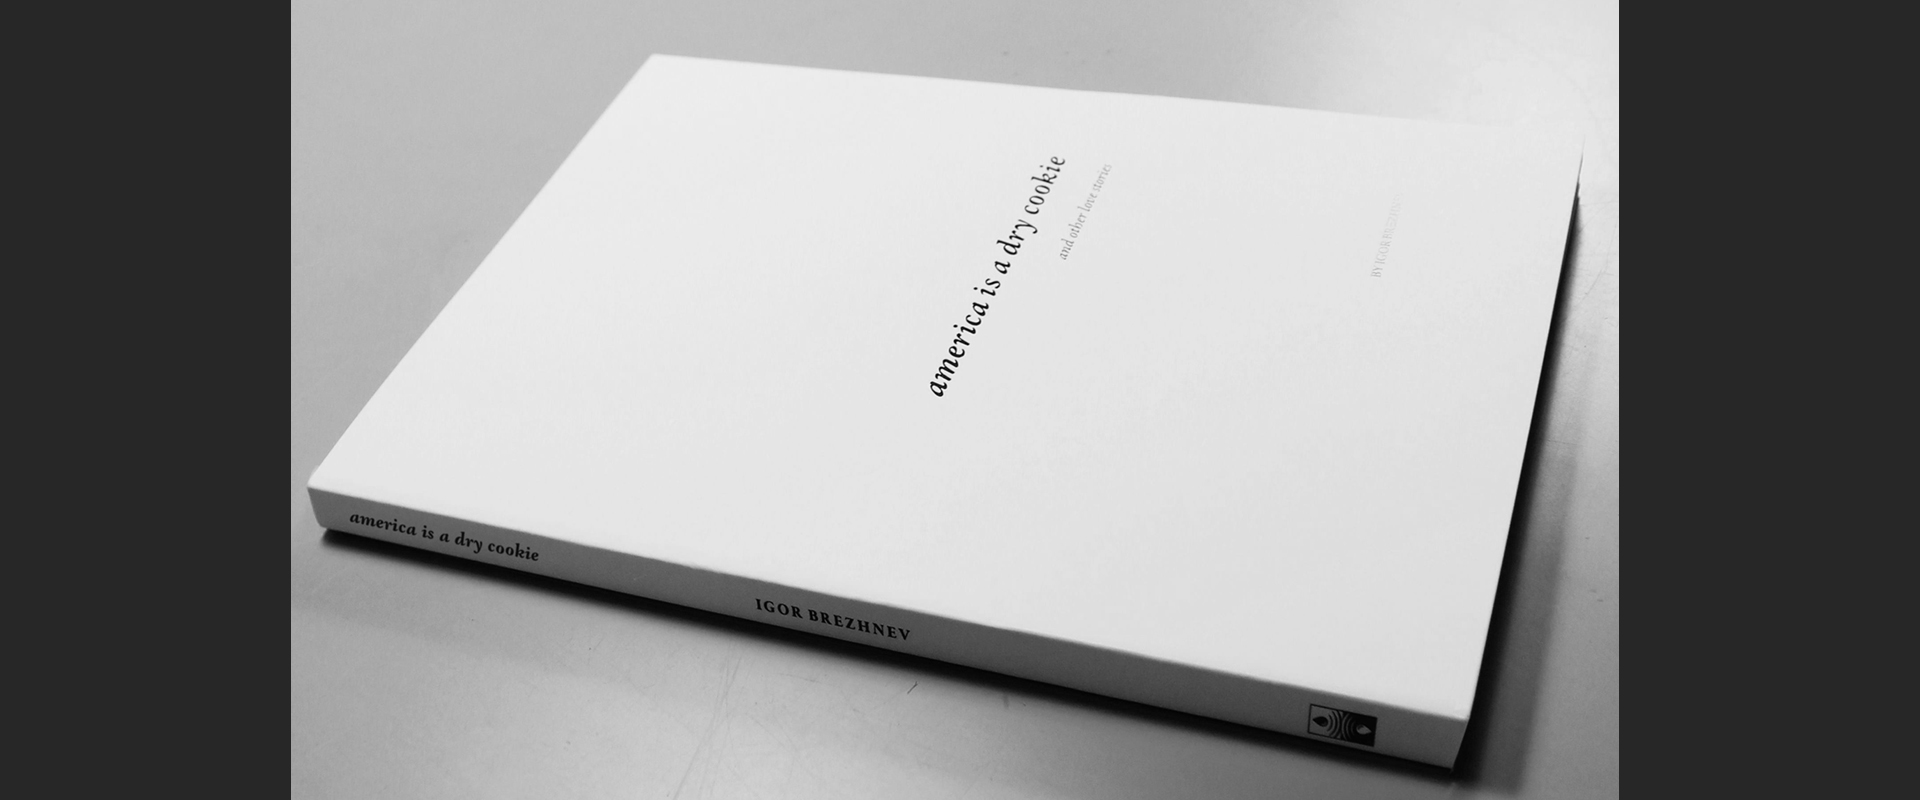 book-cover-mockup.jpg